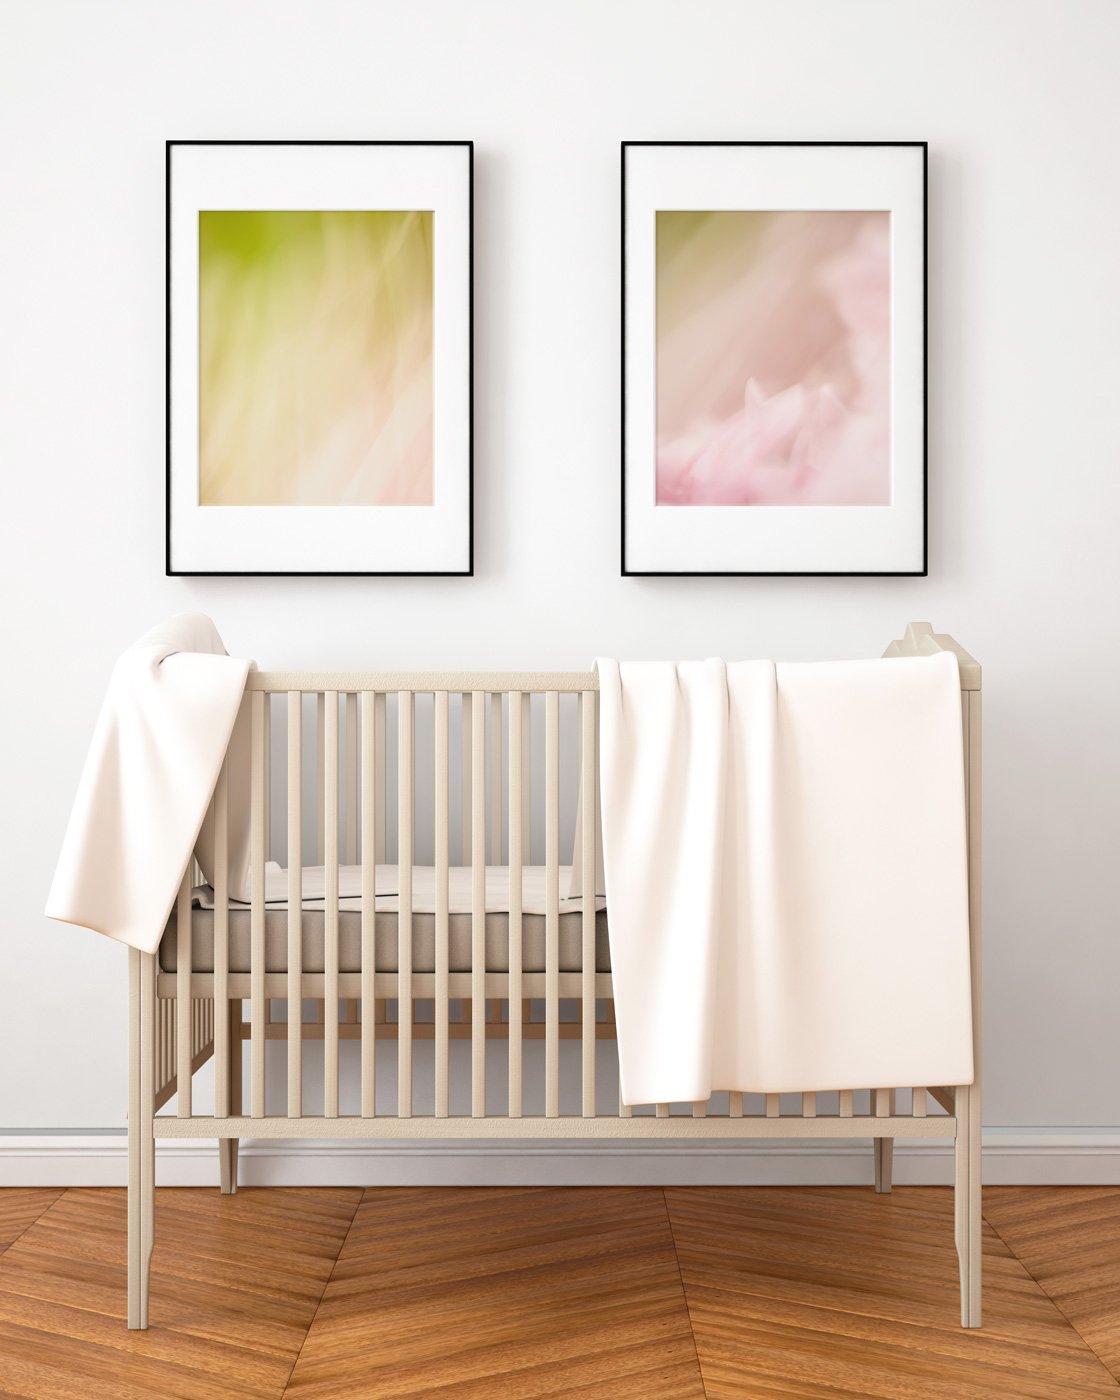 Modern nursery wall decor hailey jennifer squires - Modern nursery wall decor ...